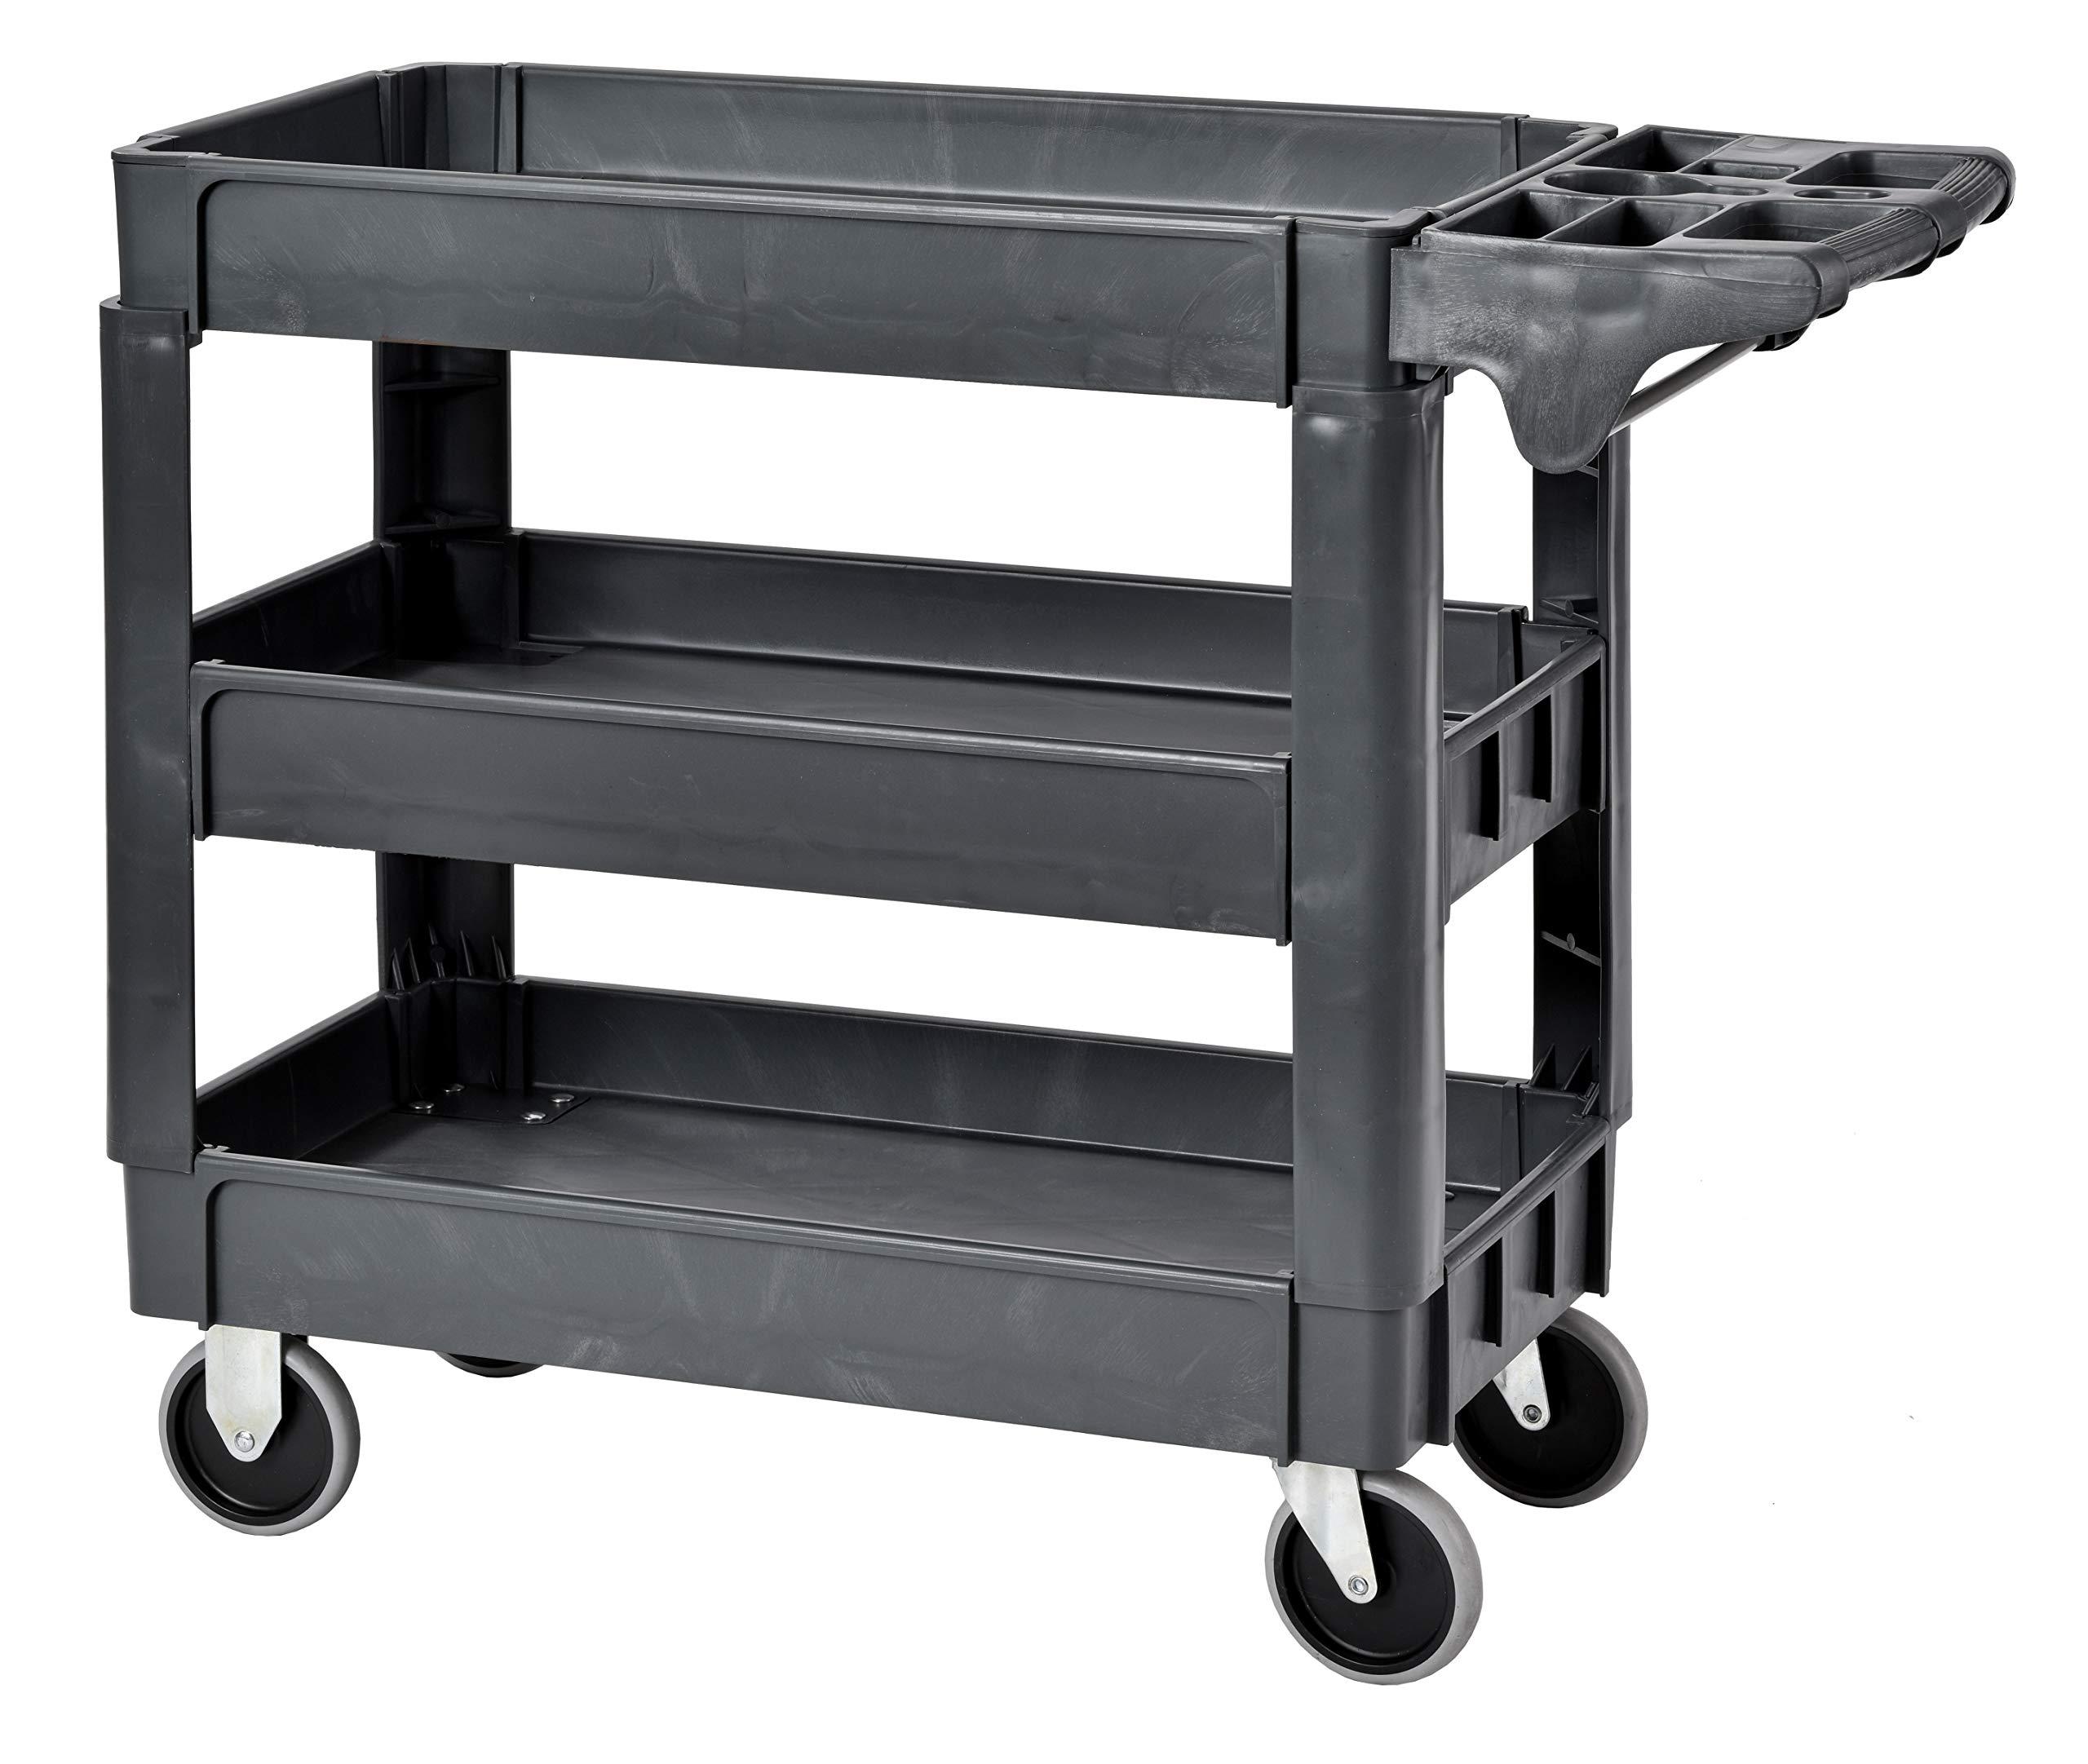 Sandusky PUC174033-3 Gray Heavy Duty Plastic Utility Cart, 3 Shelves, 40'' Height x 33'' Width x 17'' Depth